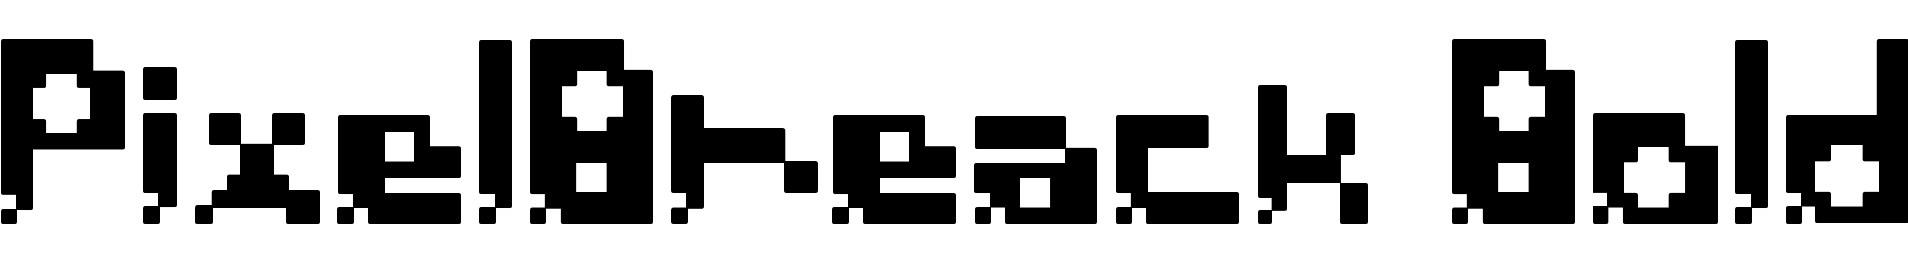 PixelBreack Bold